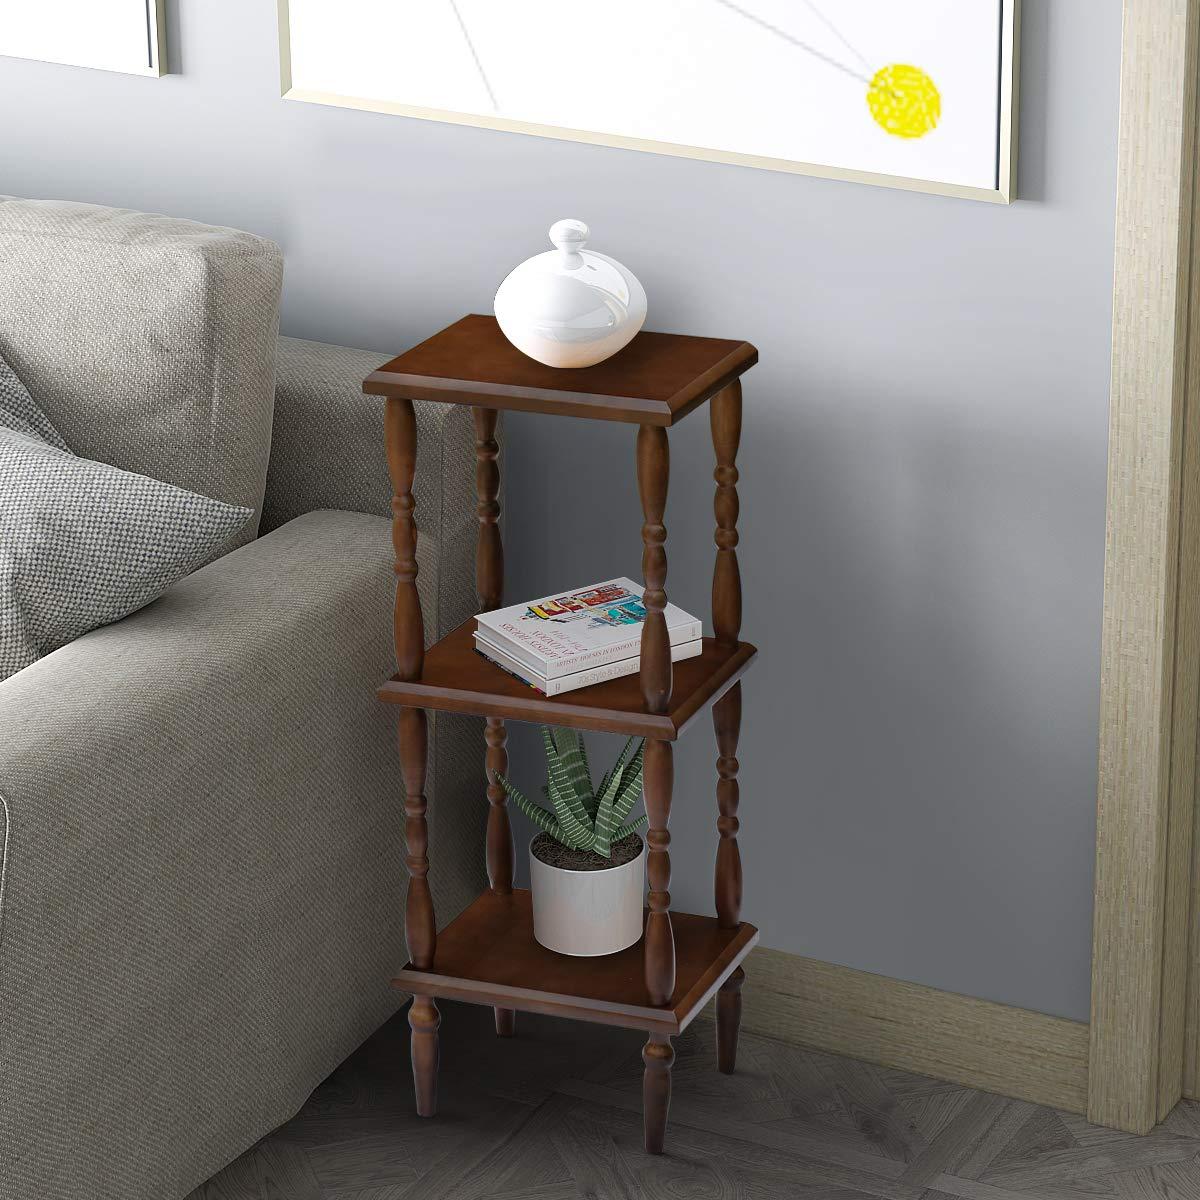 Vlush Narrow Shelving Unit,3-Tier Free Standing Storage Shelf Units Utility Corner Display Rack for Livingroom Kitchen Bedroom Balcony-100% Rubber Wood,Square